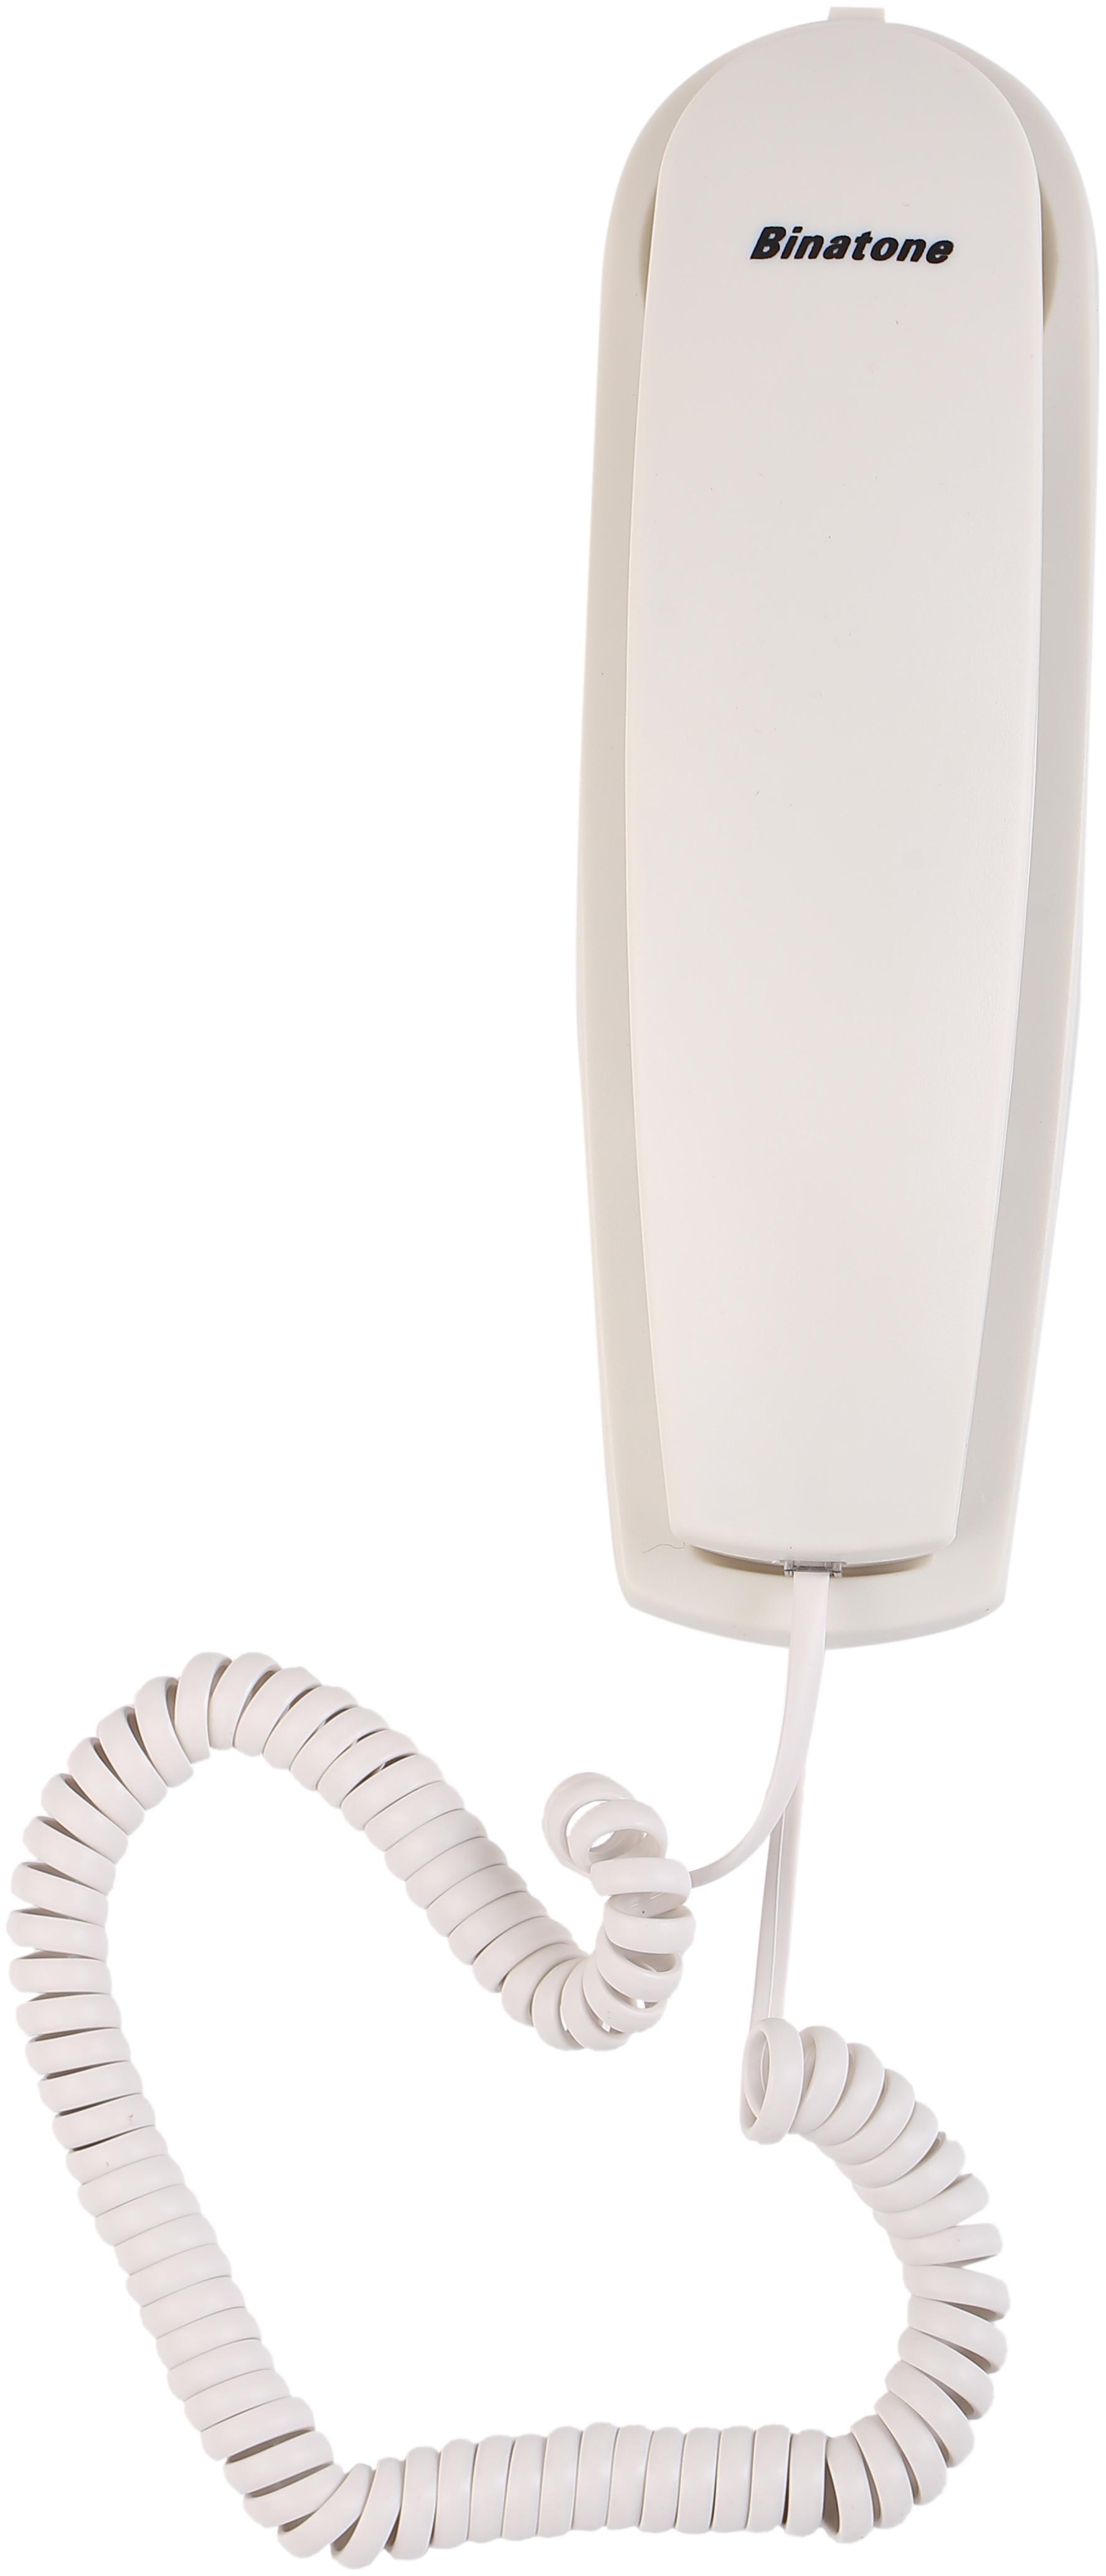 Binatone Trend 1 Corded Landline Phone  White